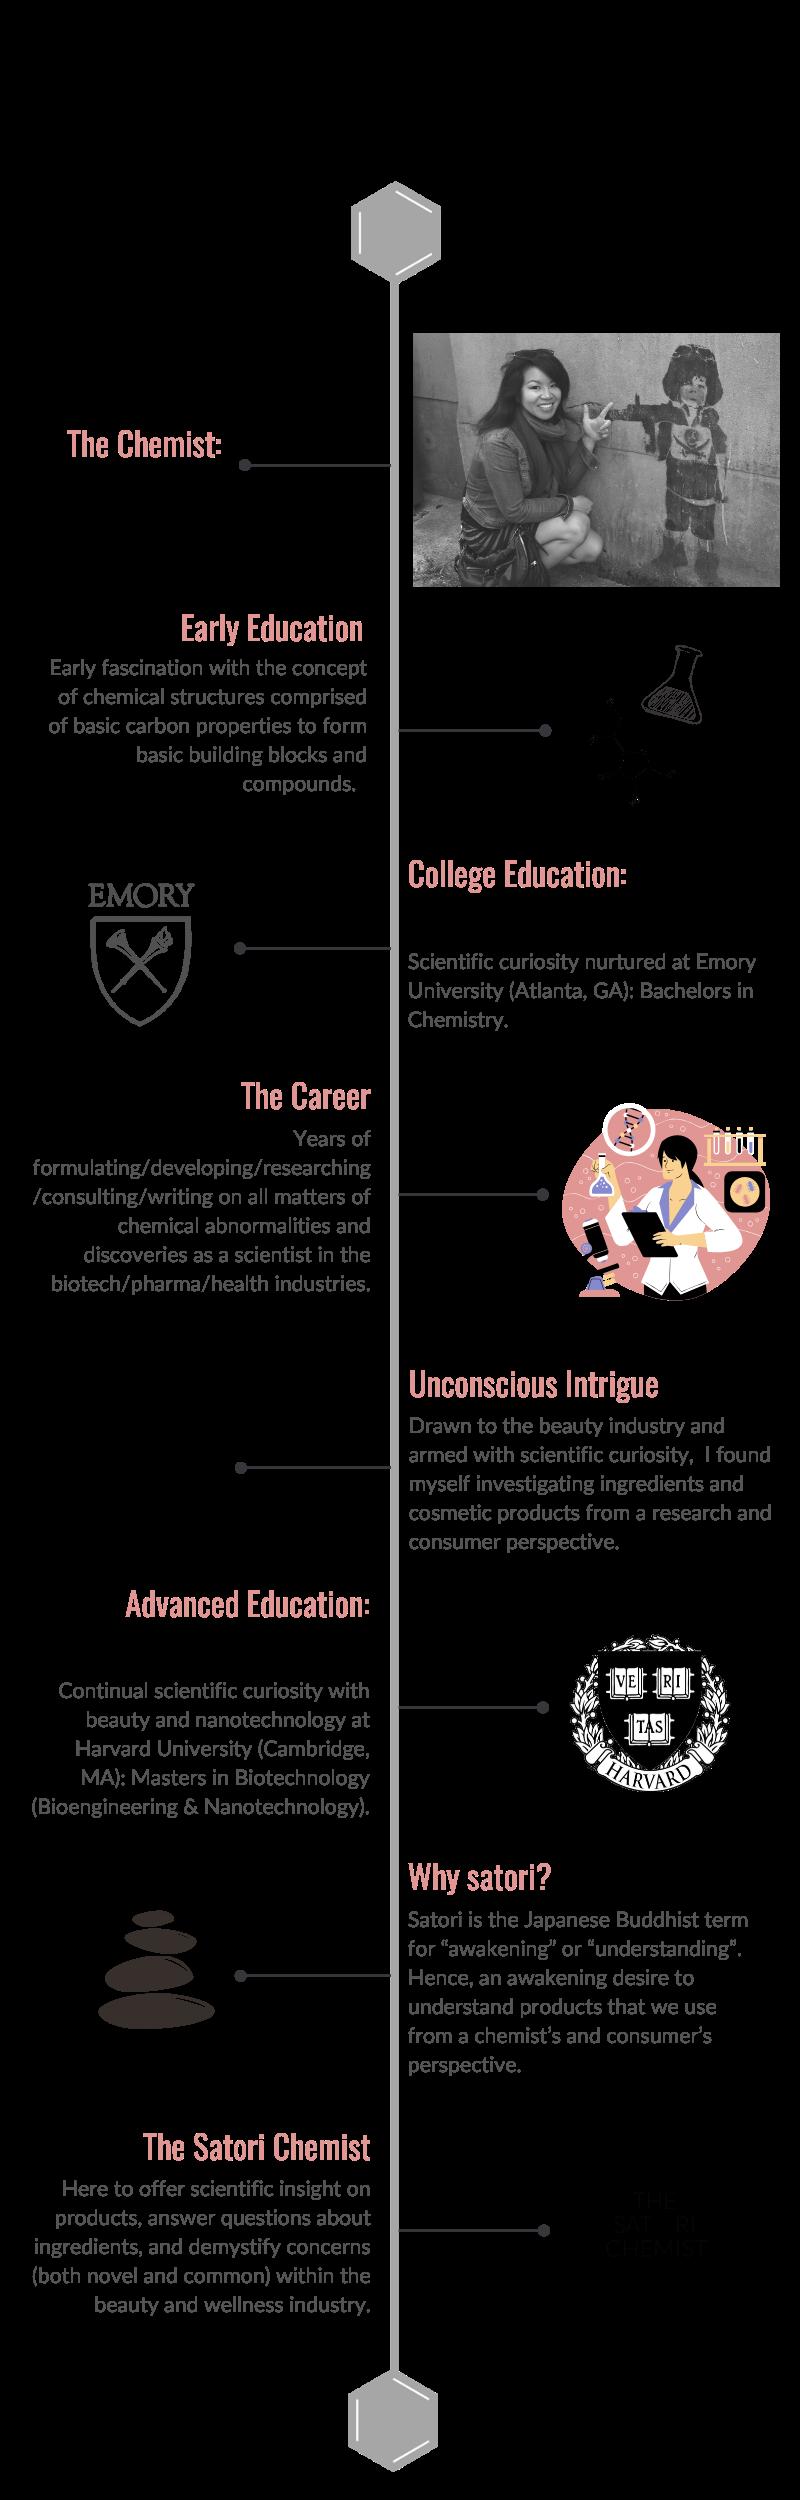 The Satori Chemist Timeline